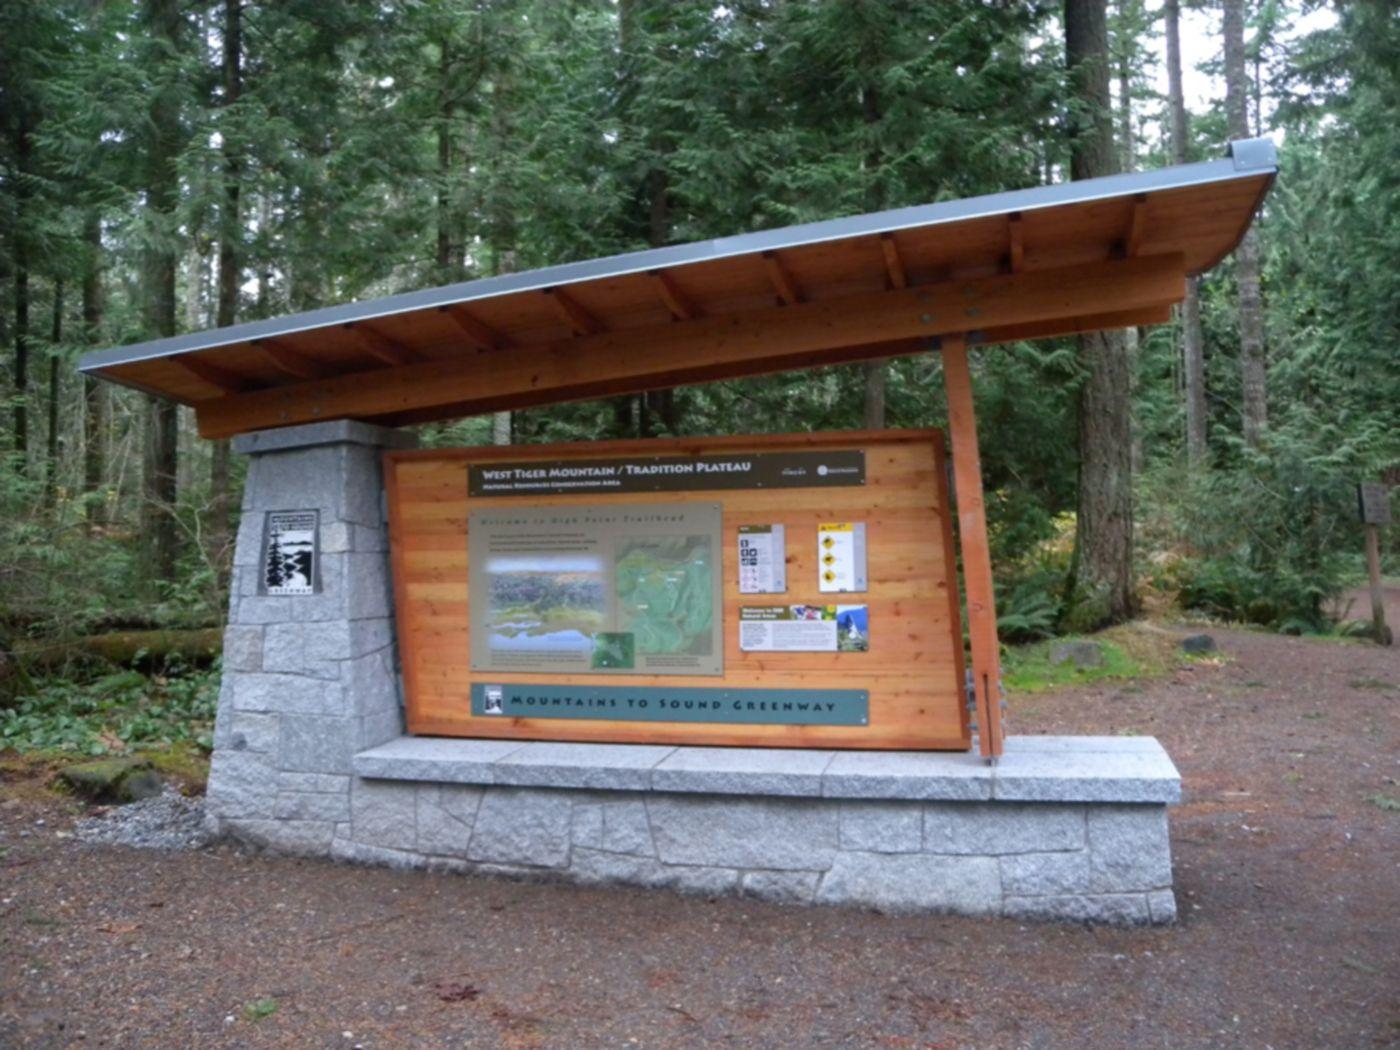 trailhead kiosk - Google Search | Trailhead Kiosk Design